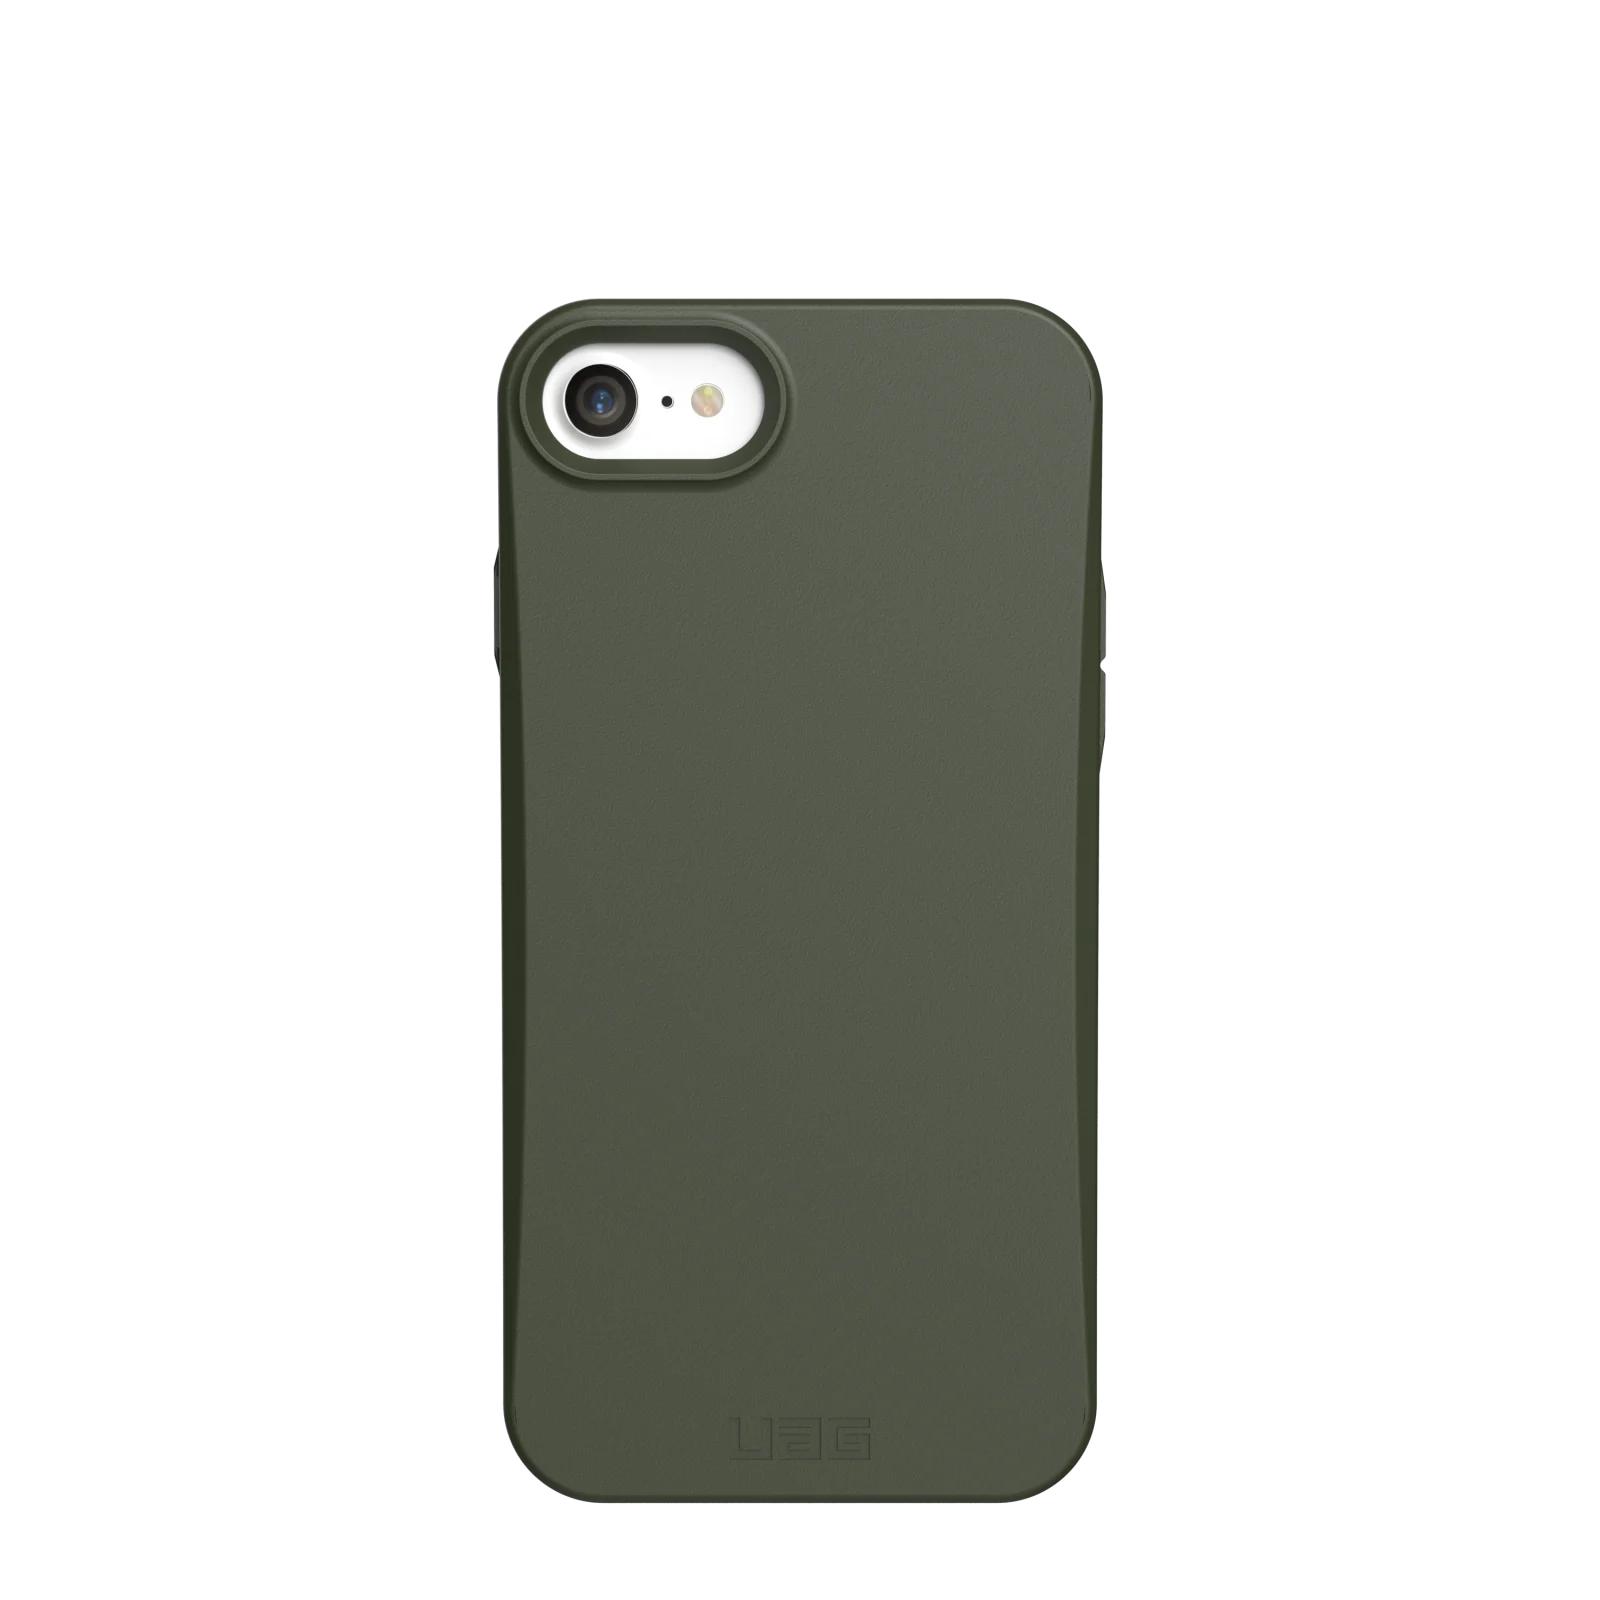 "Urban Armor Gear Biodegradable Outback funda para teléfono móvil 11,9 cm (4.7"") Carcasa rígida Oliva"